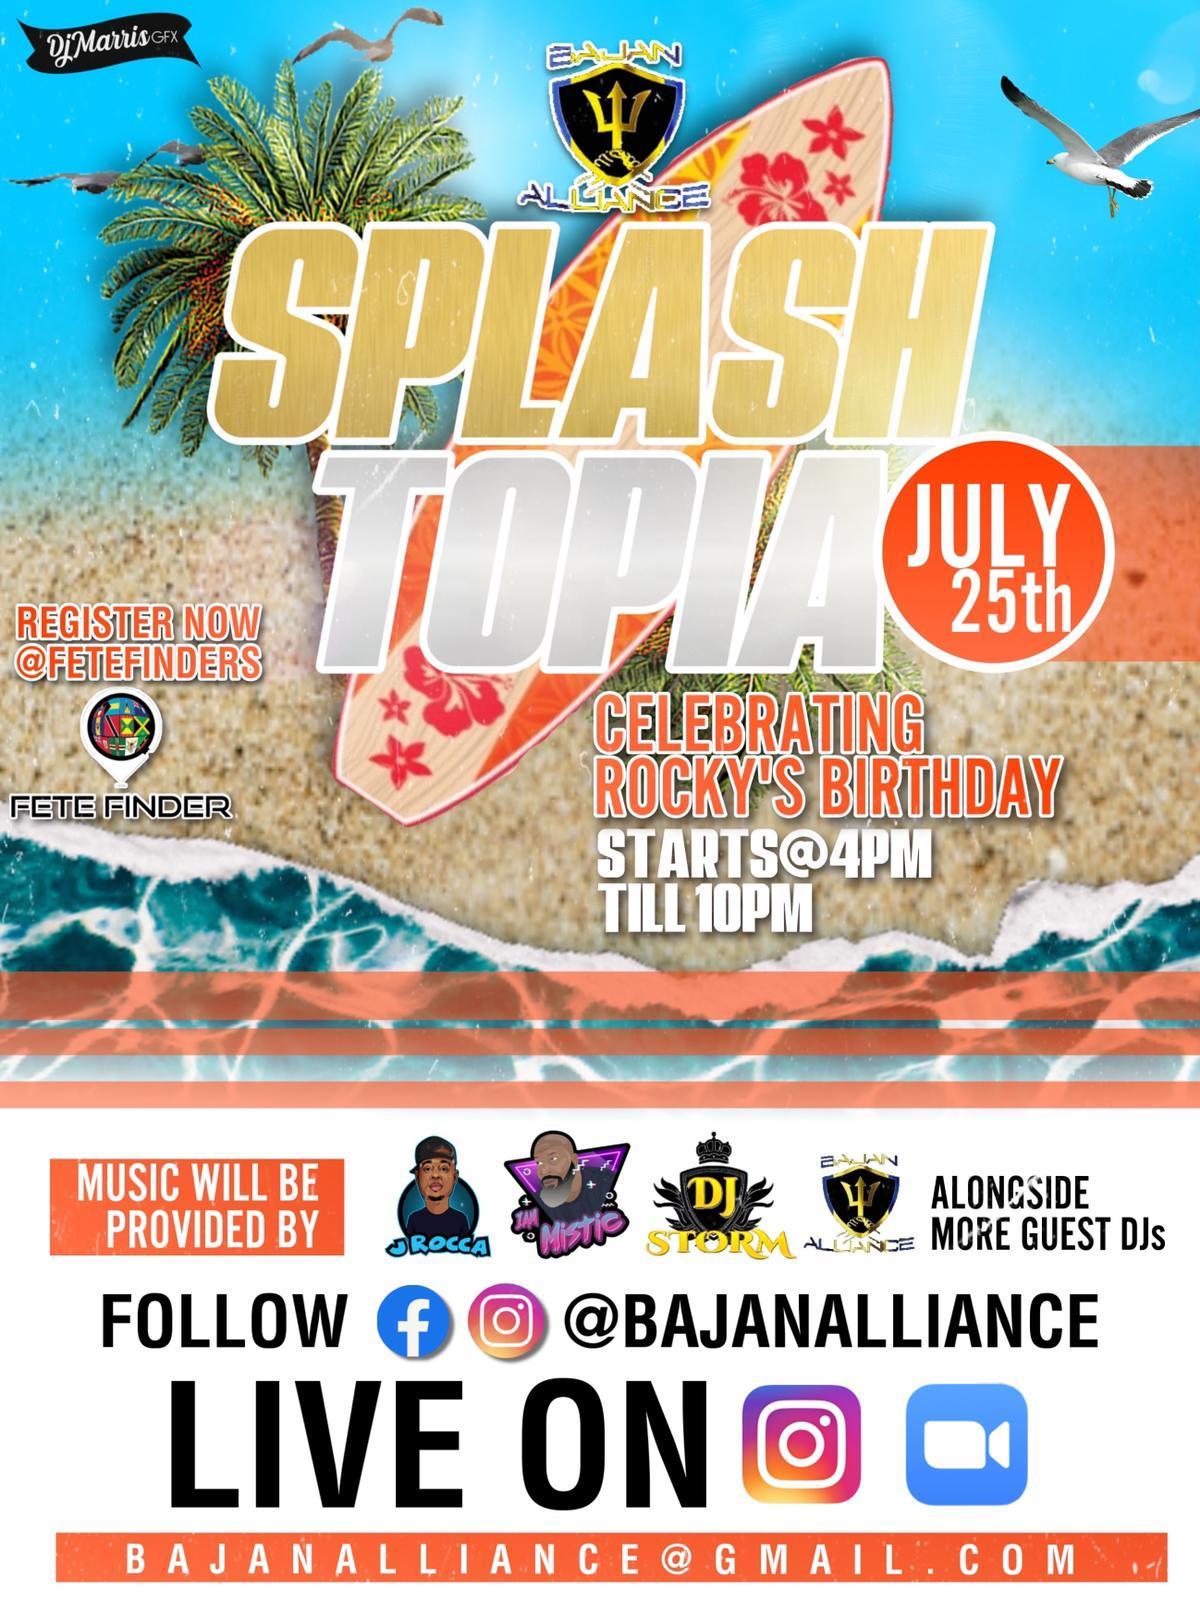 Splashtopia flyer or graphic.